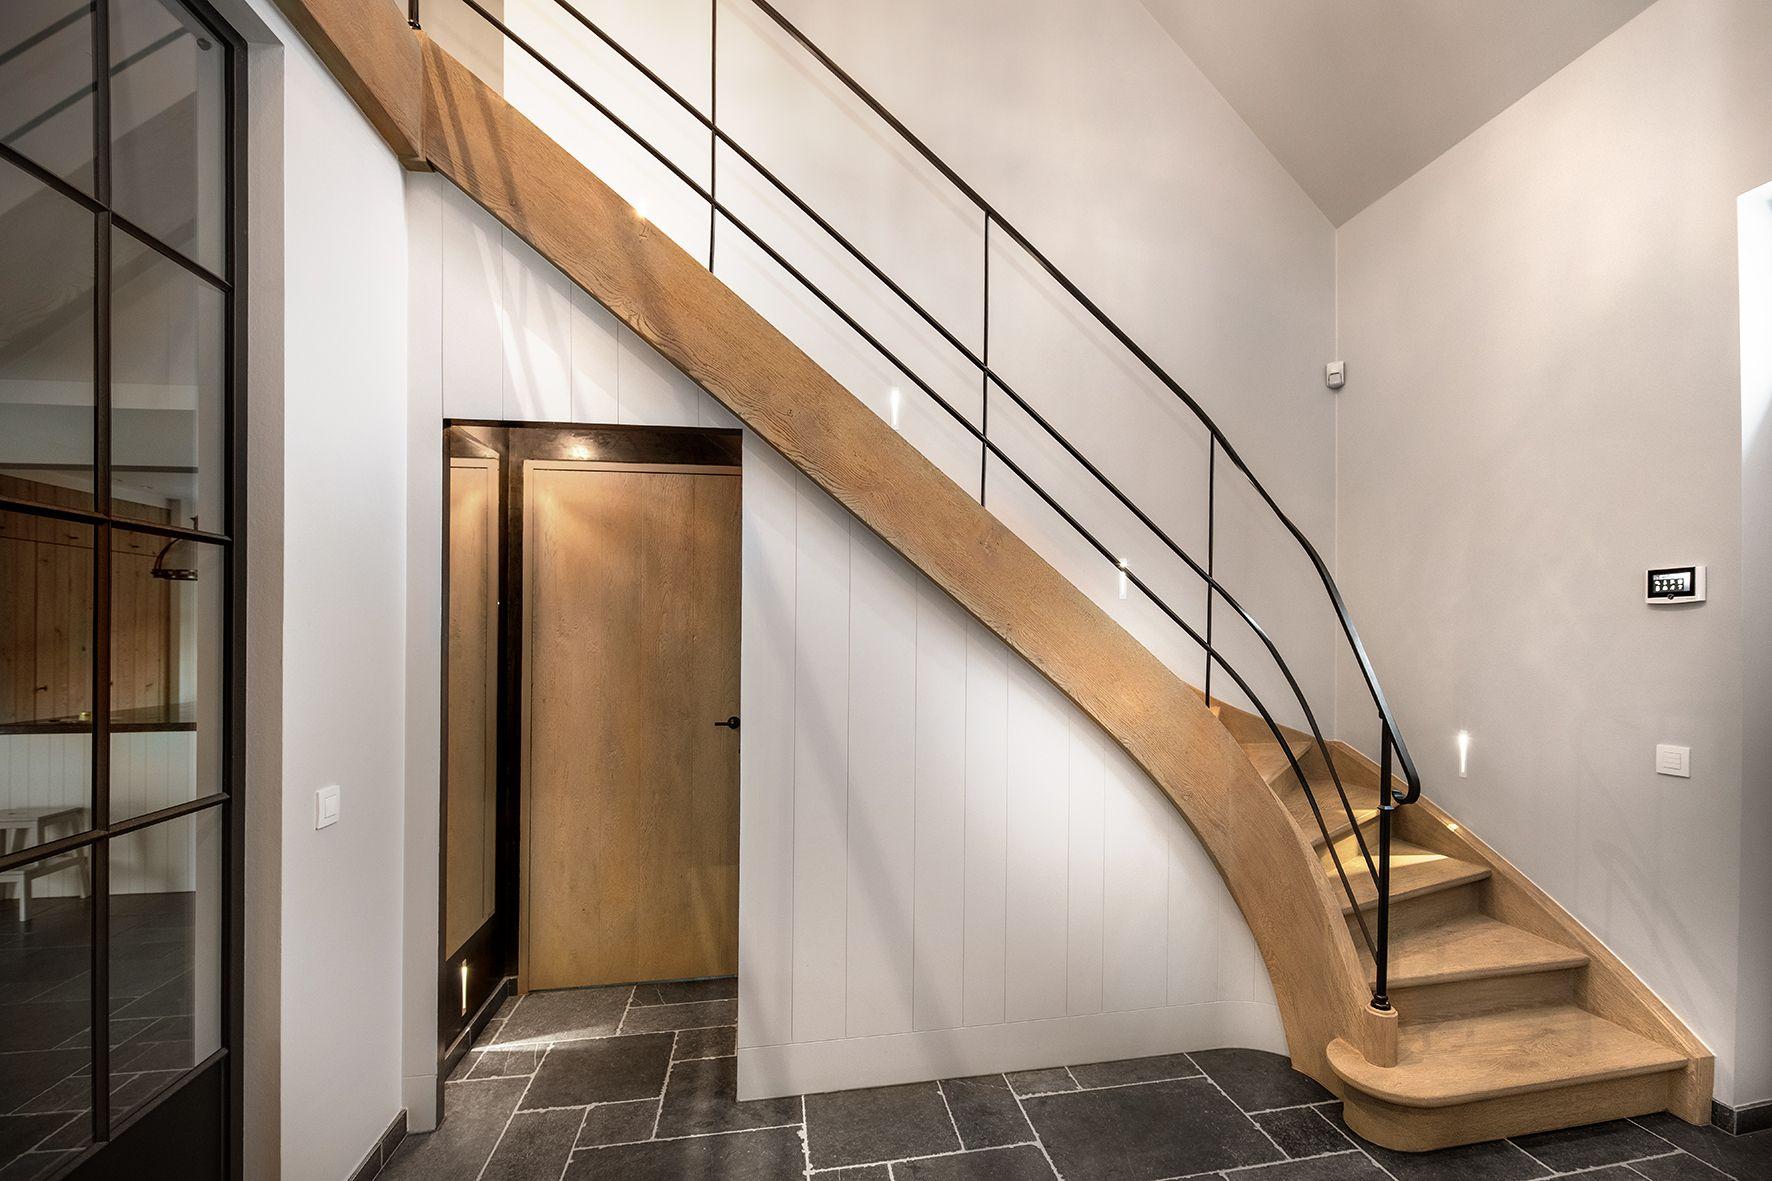 Super Trap met smeedwerk trapleuning | Houten trap op maat | Trap maken YZ-74